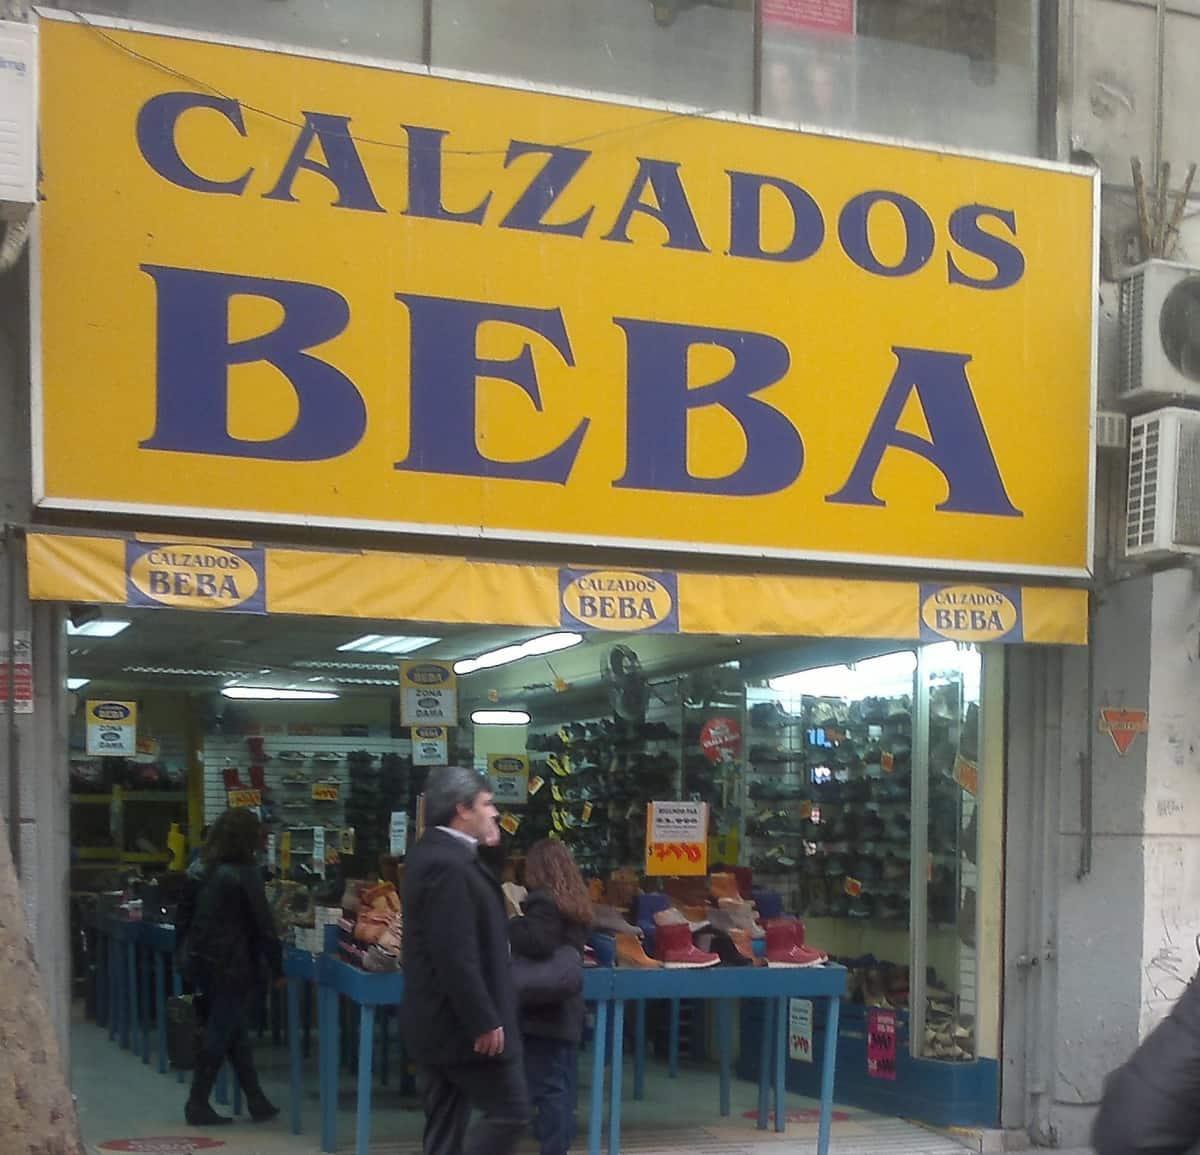 27b4b6ea3bc65 Fotos de Calzados Beba - Alameda en Santiago (comuna) CIVICO.com